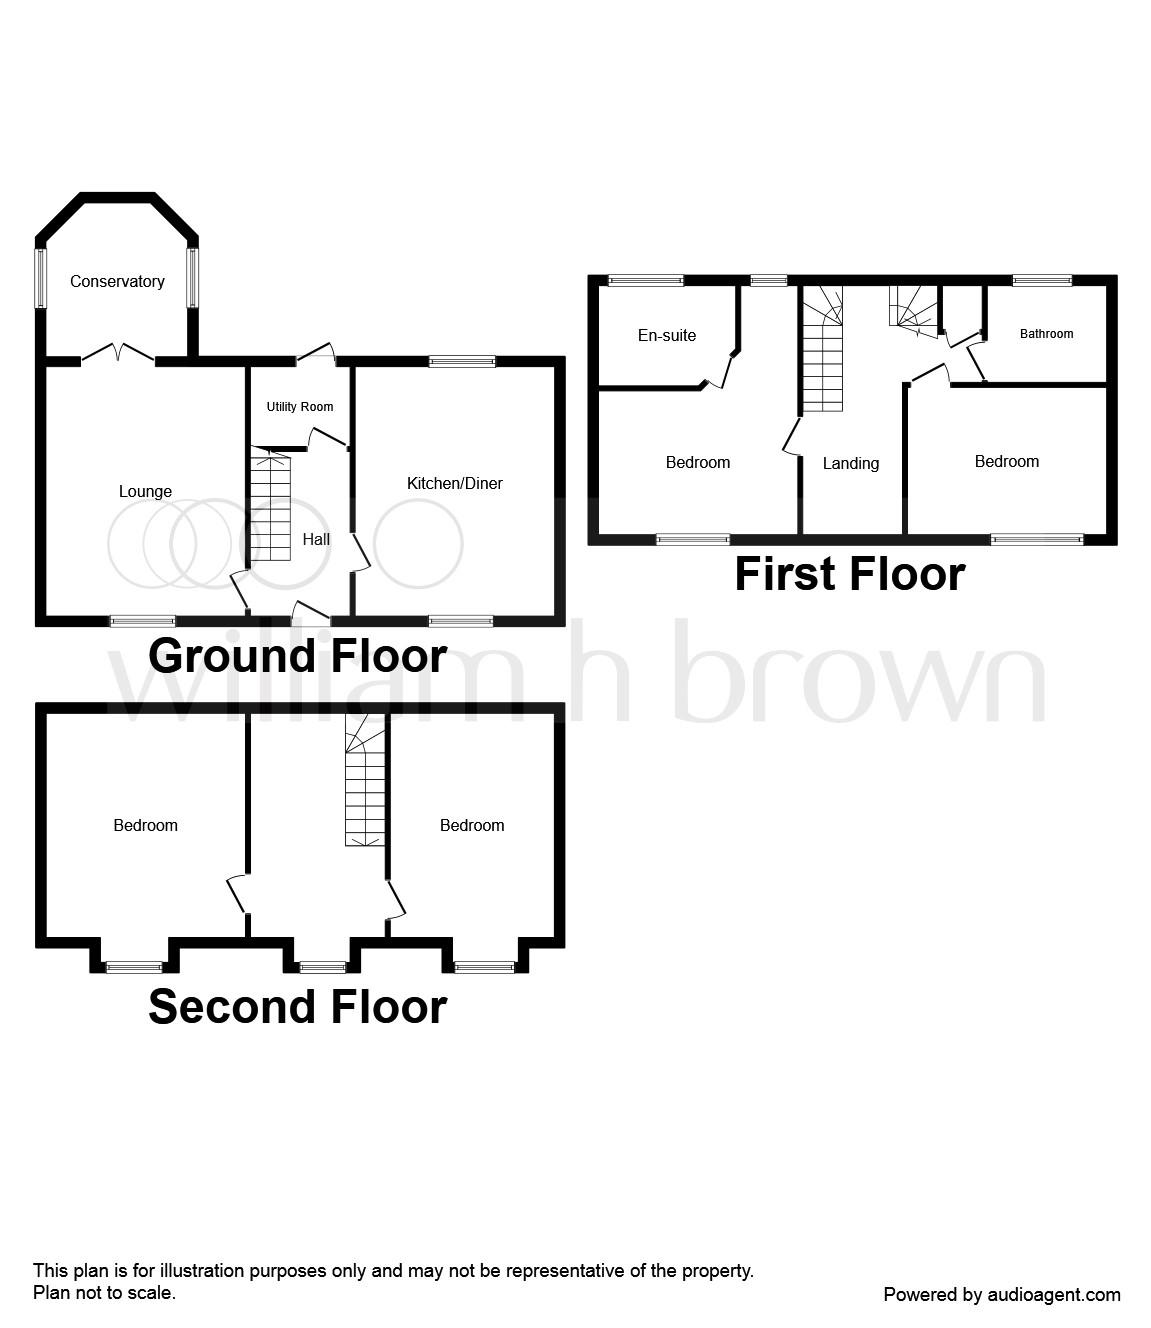 Saxon Way, Ancaster, Grantham NG32, 4 bedroom detached